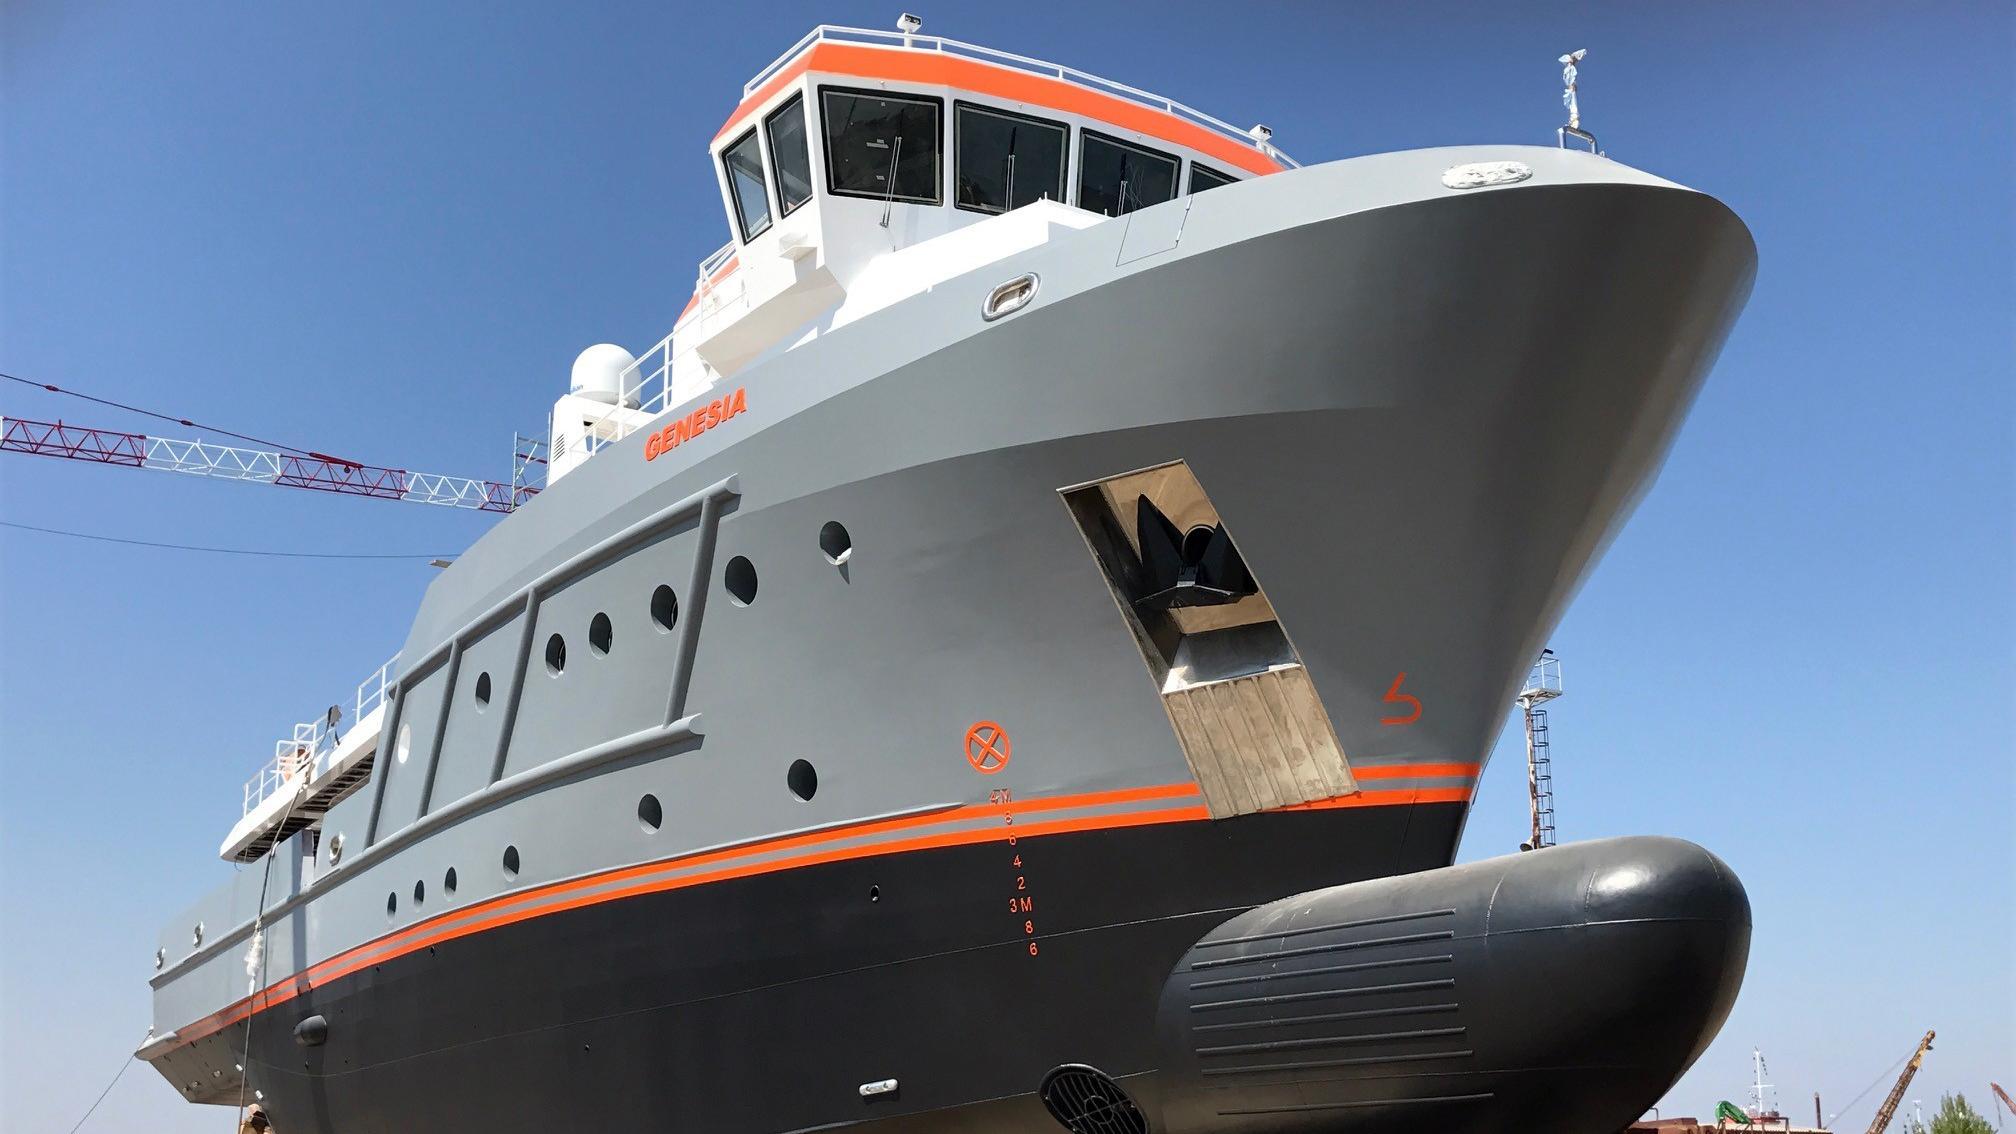 genesia motoryacht chioggia ocean king 130 yacht 40m 2017 launch bow